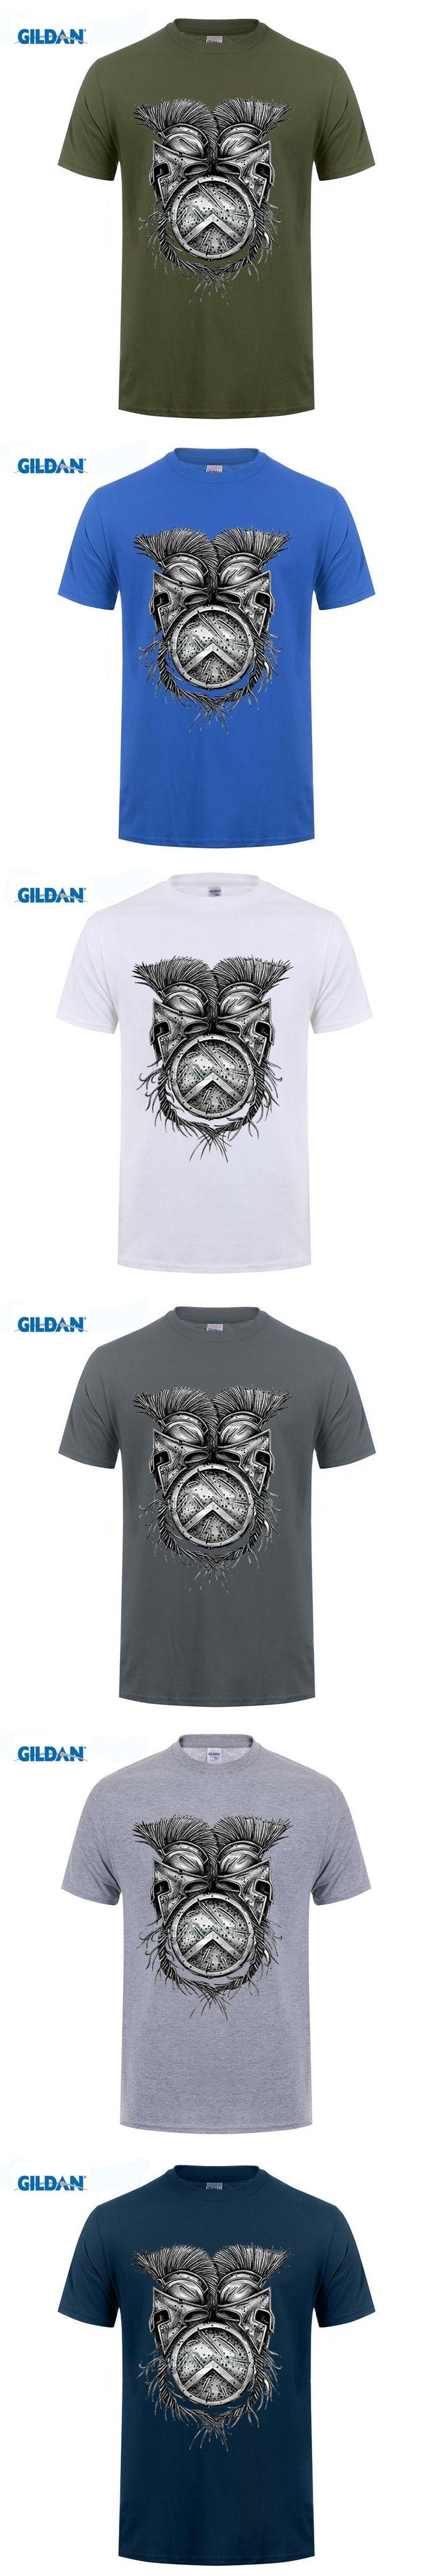 GILDAN customised T-shirt Spartan Helmets Shield Custom Designed Funny T Shirt Men 100% Short Sleeve Brand Clothing For Adult